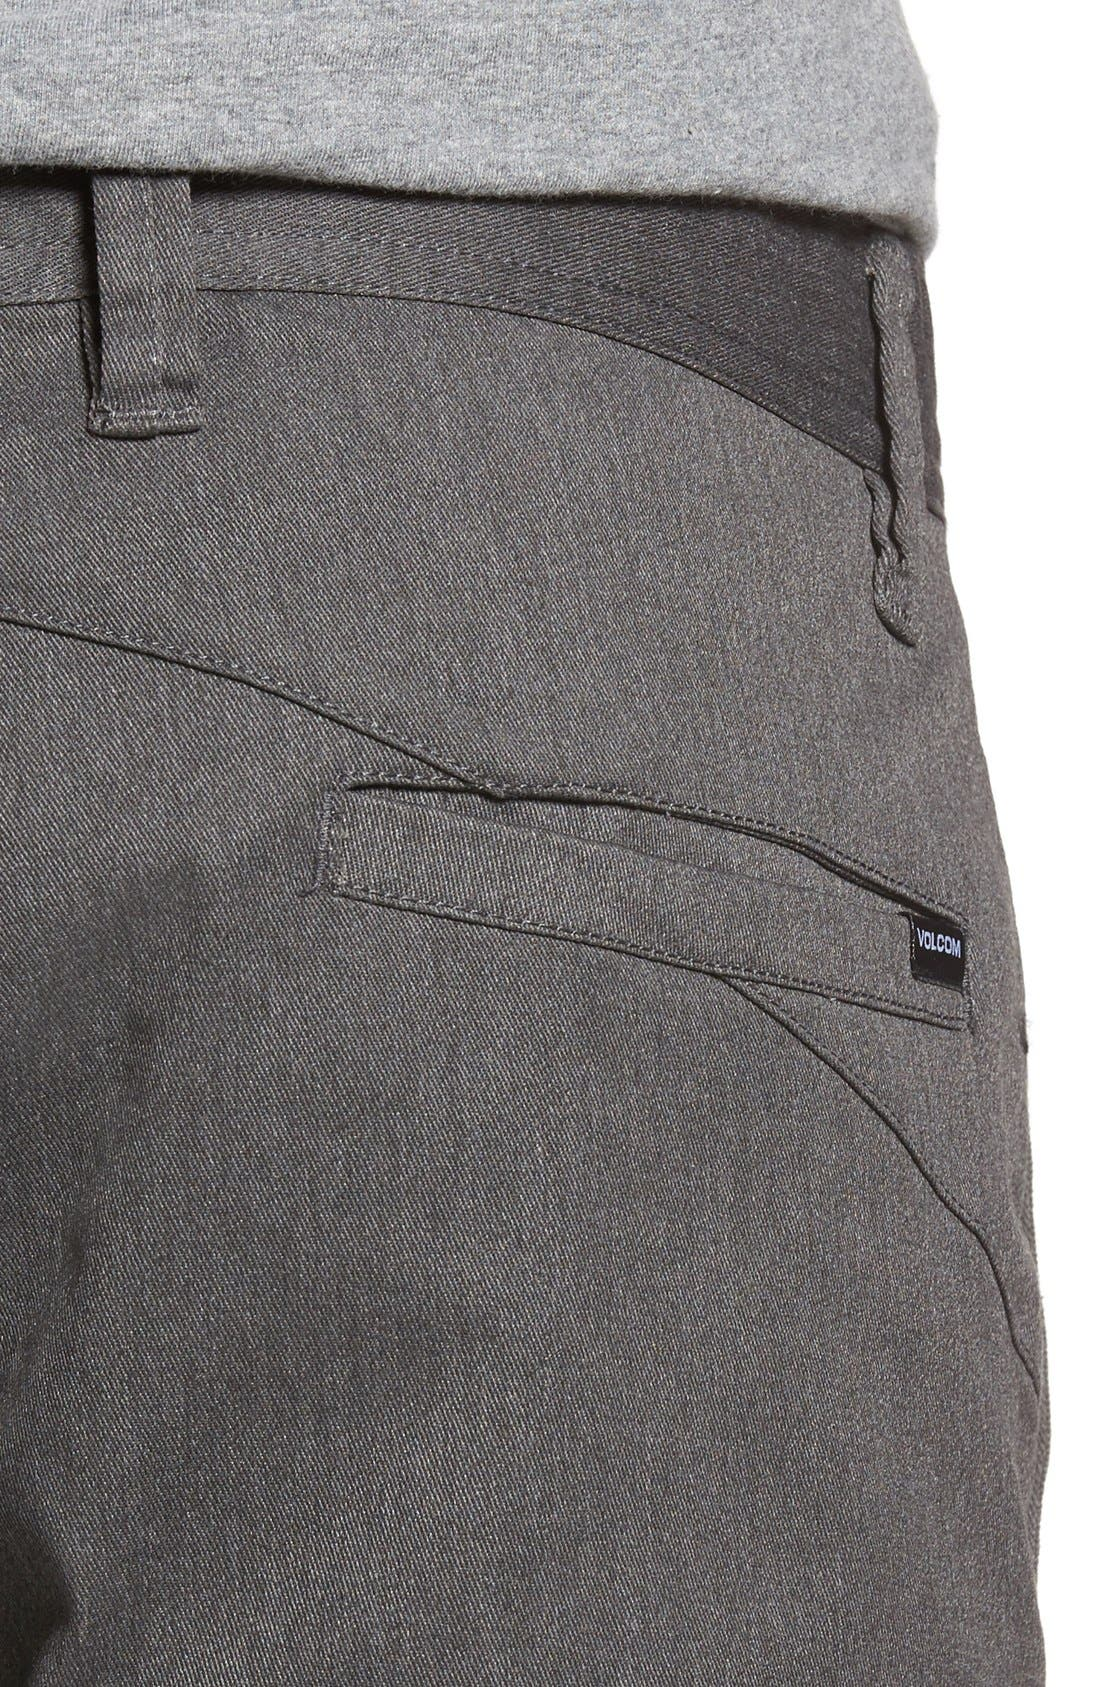 'Modern' Stretch Chino Shorts,                             Alternate thumbnail 37, color,